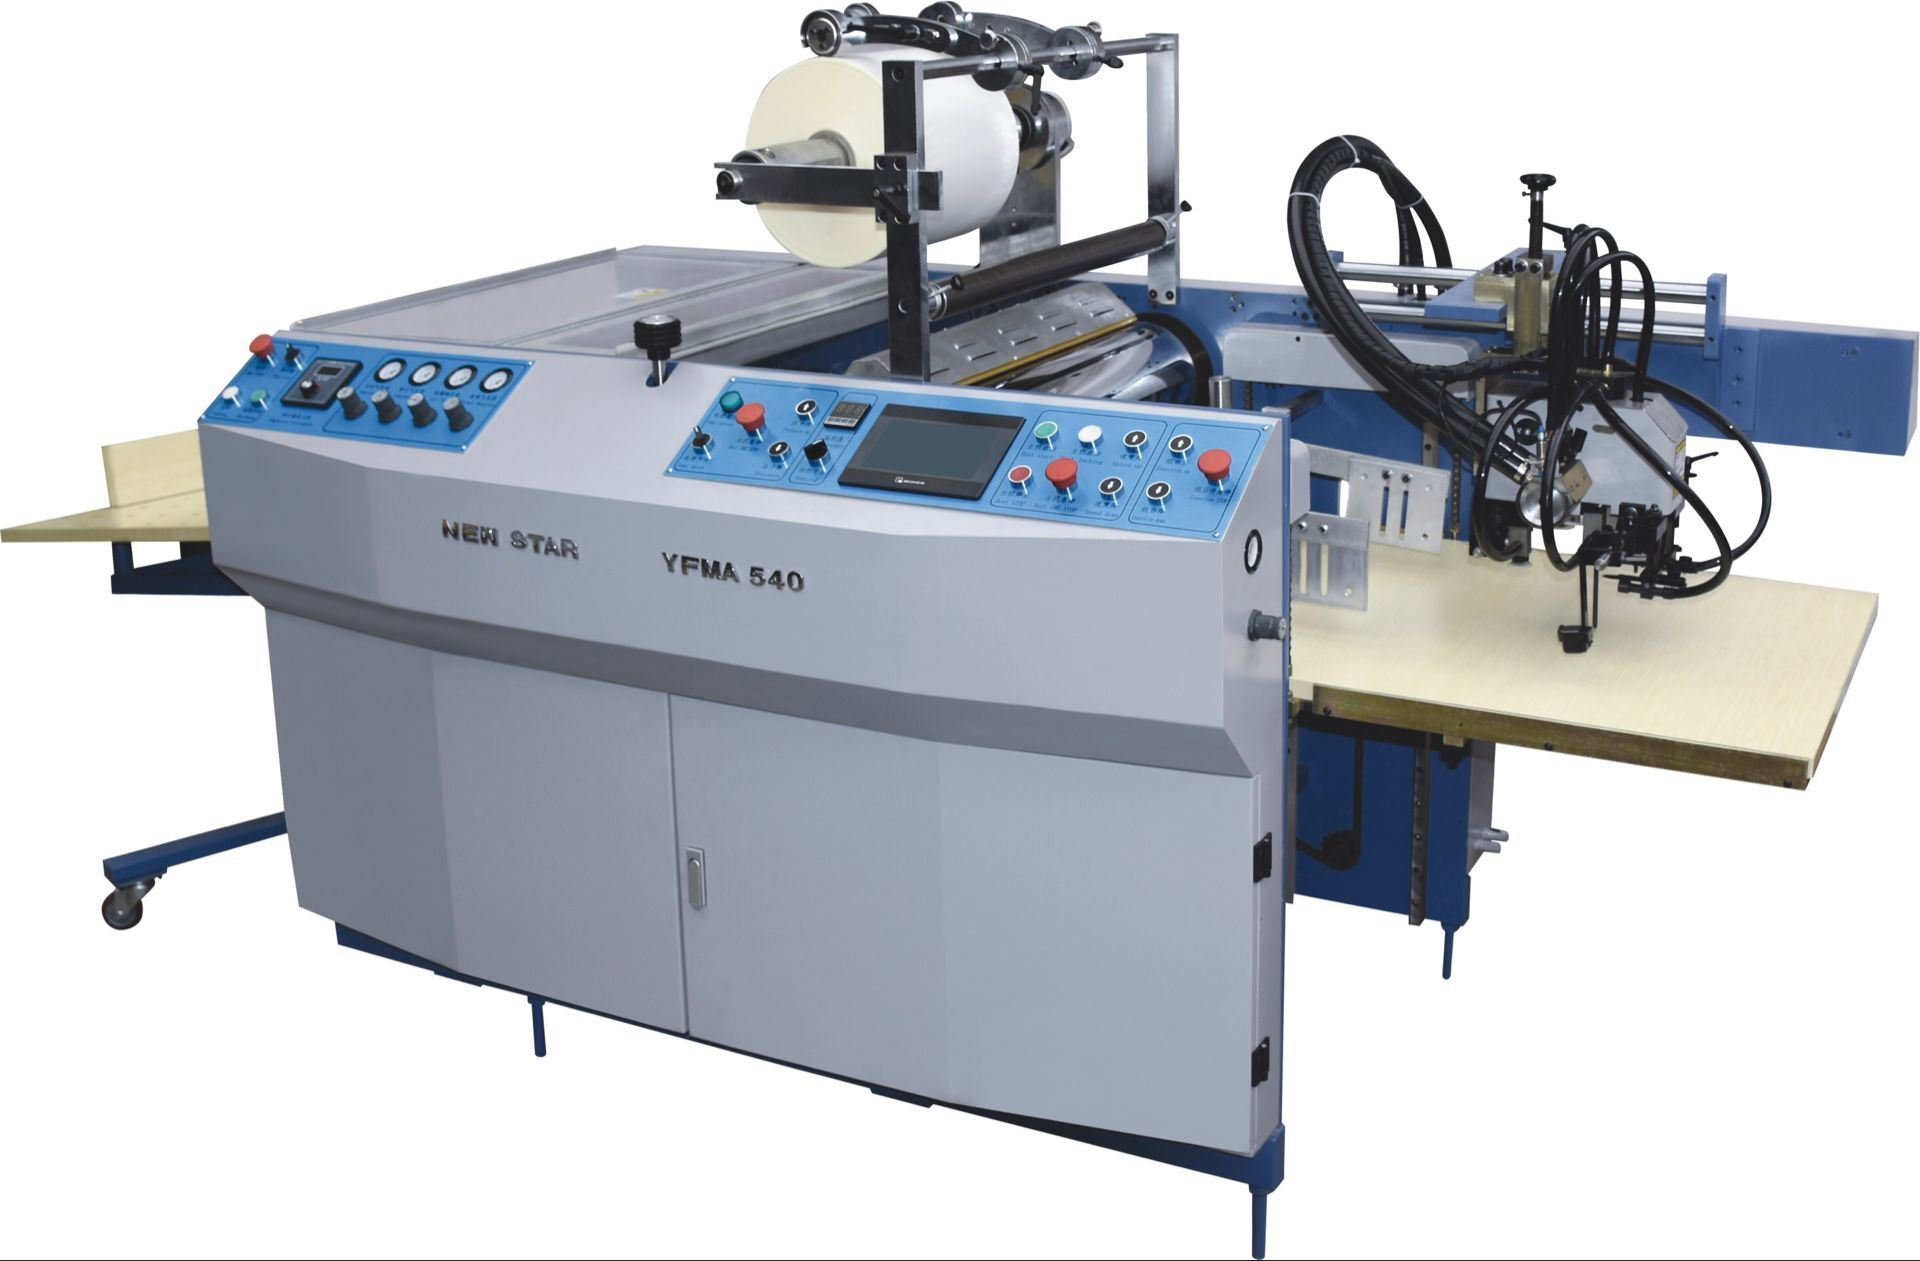 Yfma 540 Automatic Laminating Machine, Electromagnatic Laminating Machine, Induction Laminating Machine